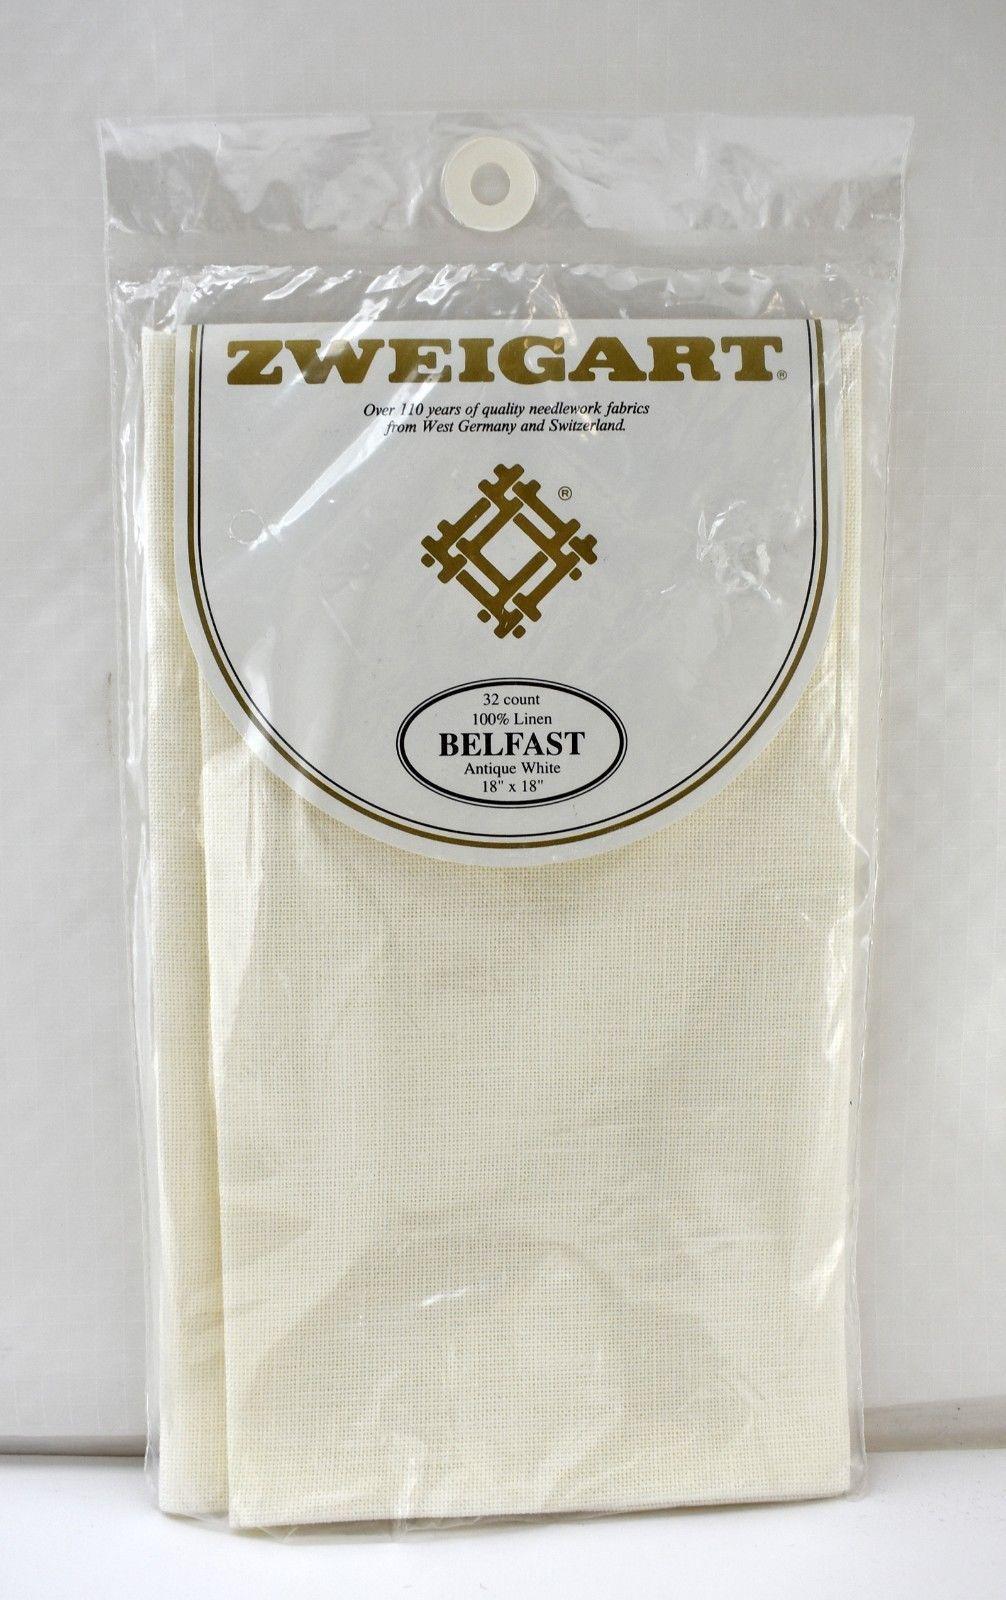 "Zweigart Belfast 32 Count 100% Linen Cross Stitch Fabric - Antique White 18""x18"" - $14.20"